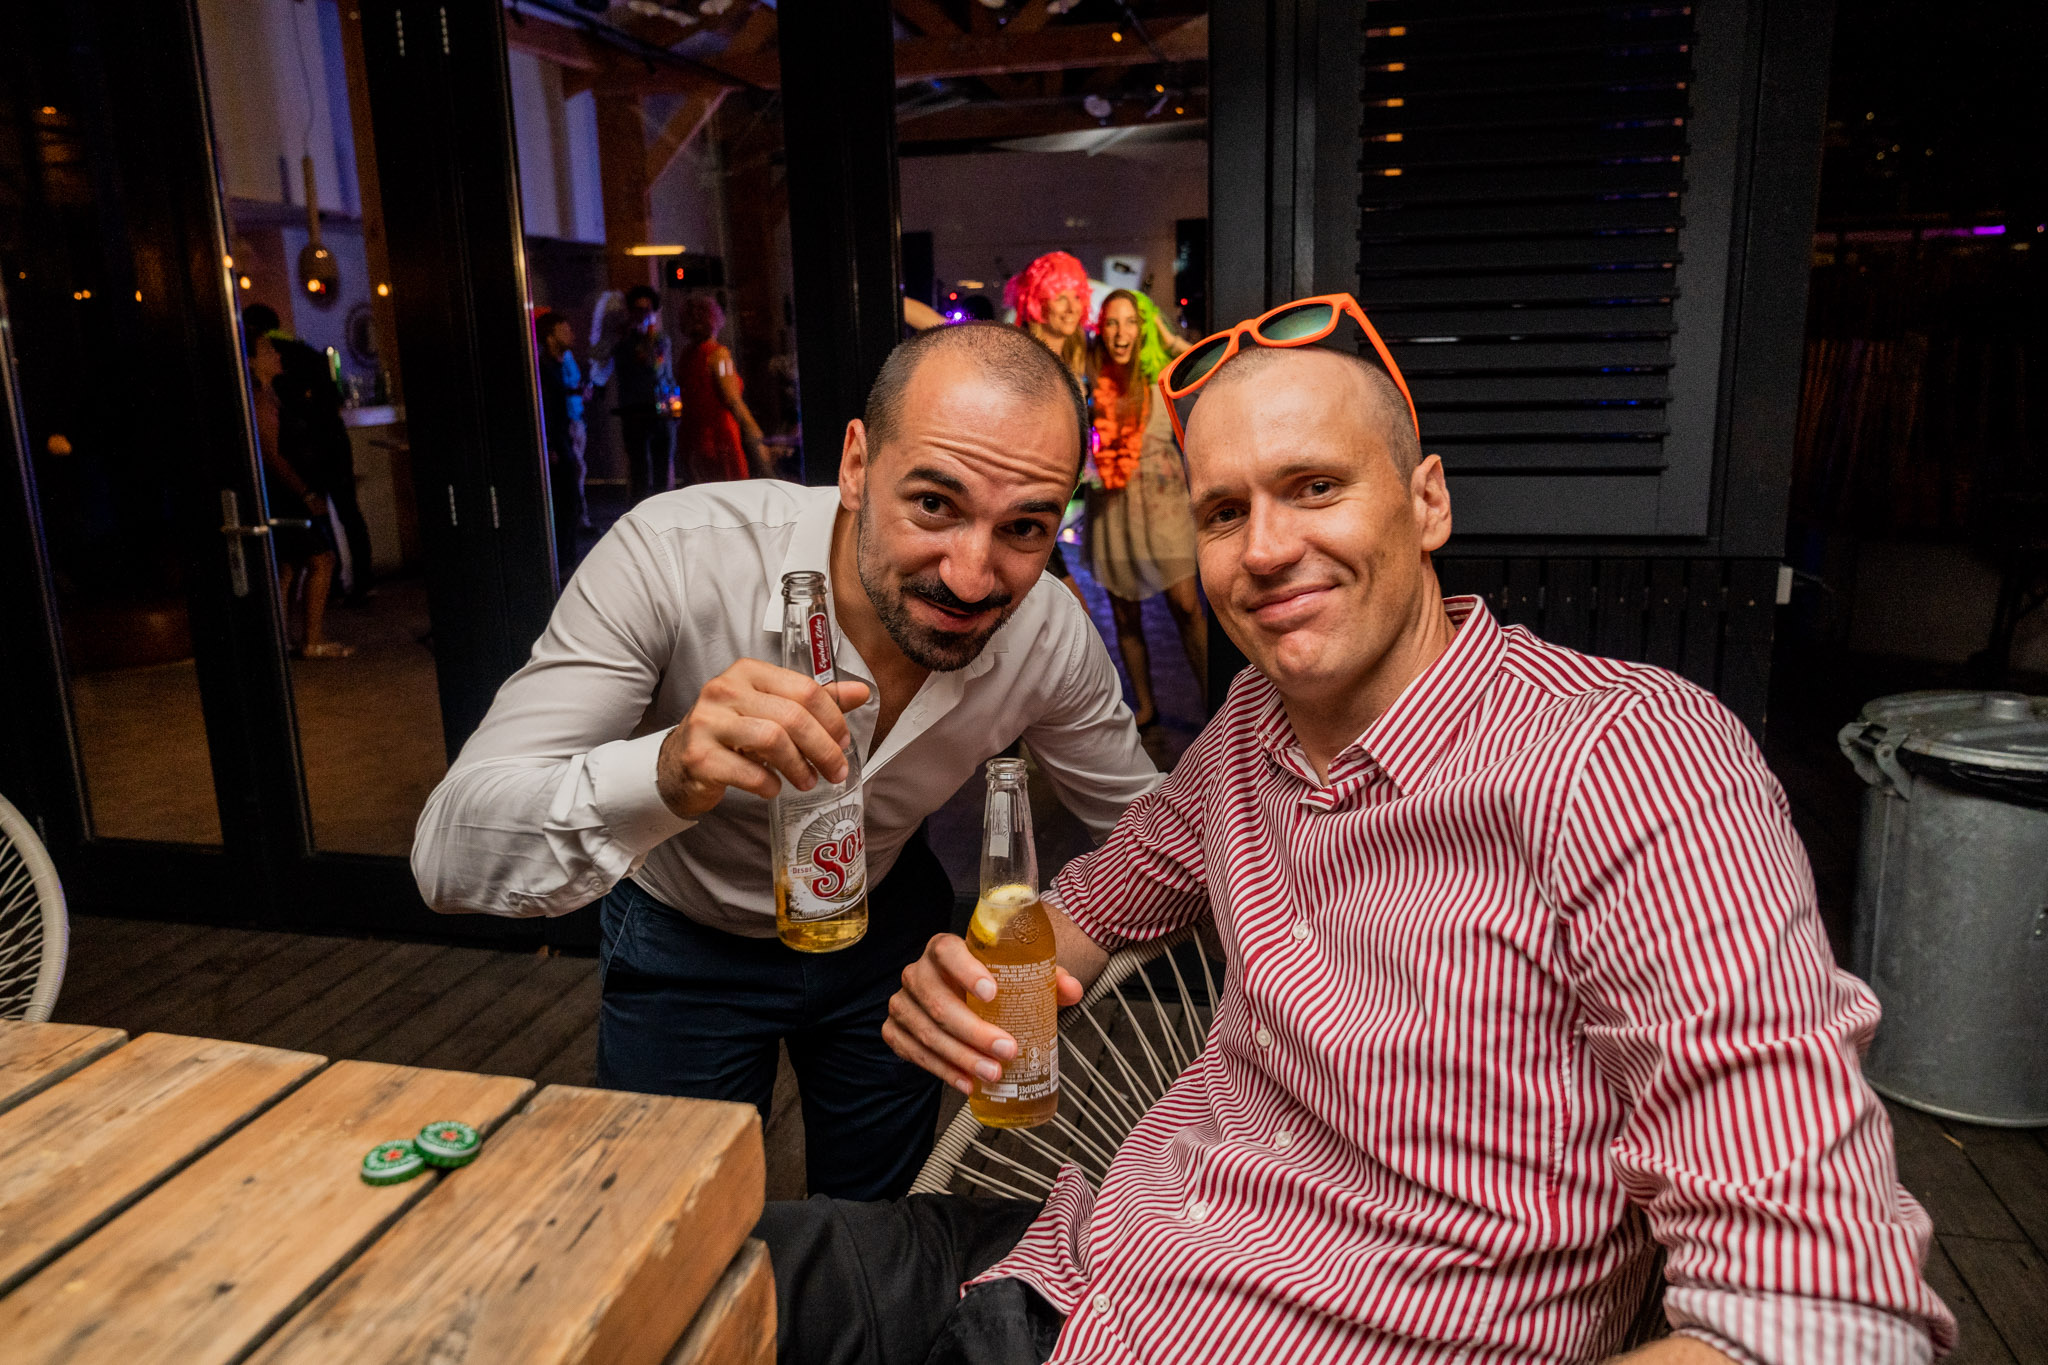 Pierre-Yves Jortay - Break The Ice Forum - Amsterdam 08-2019 - 143.jpg